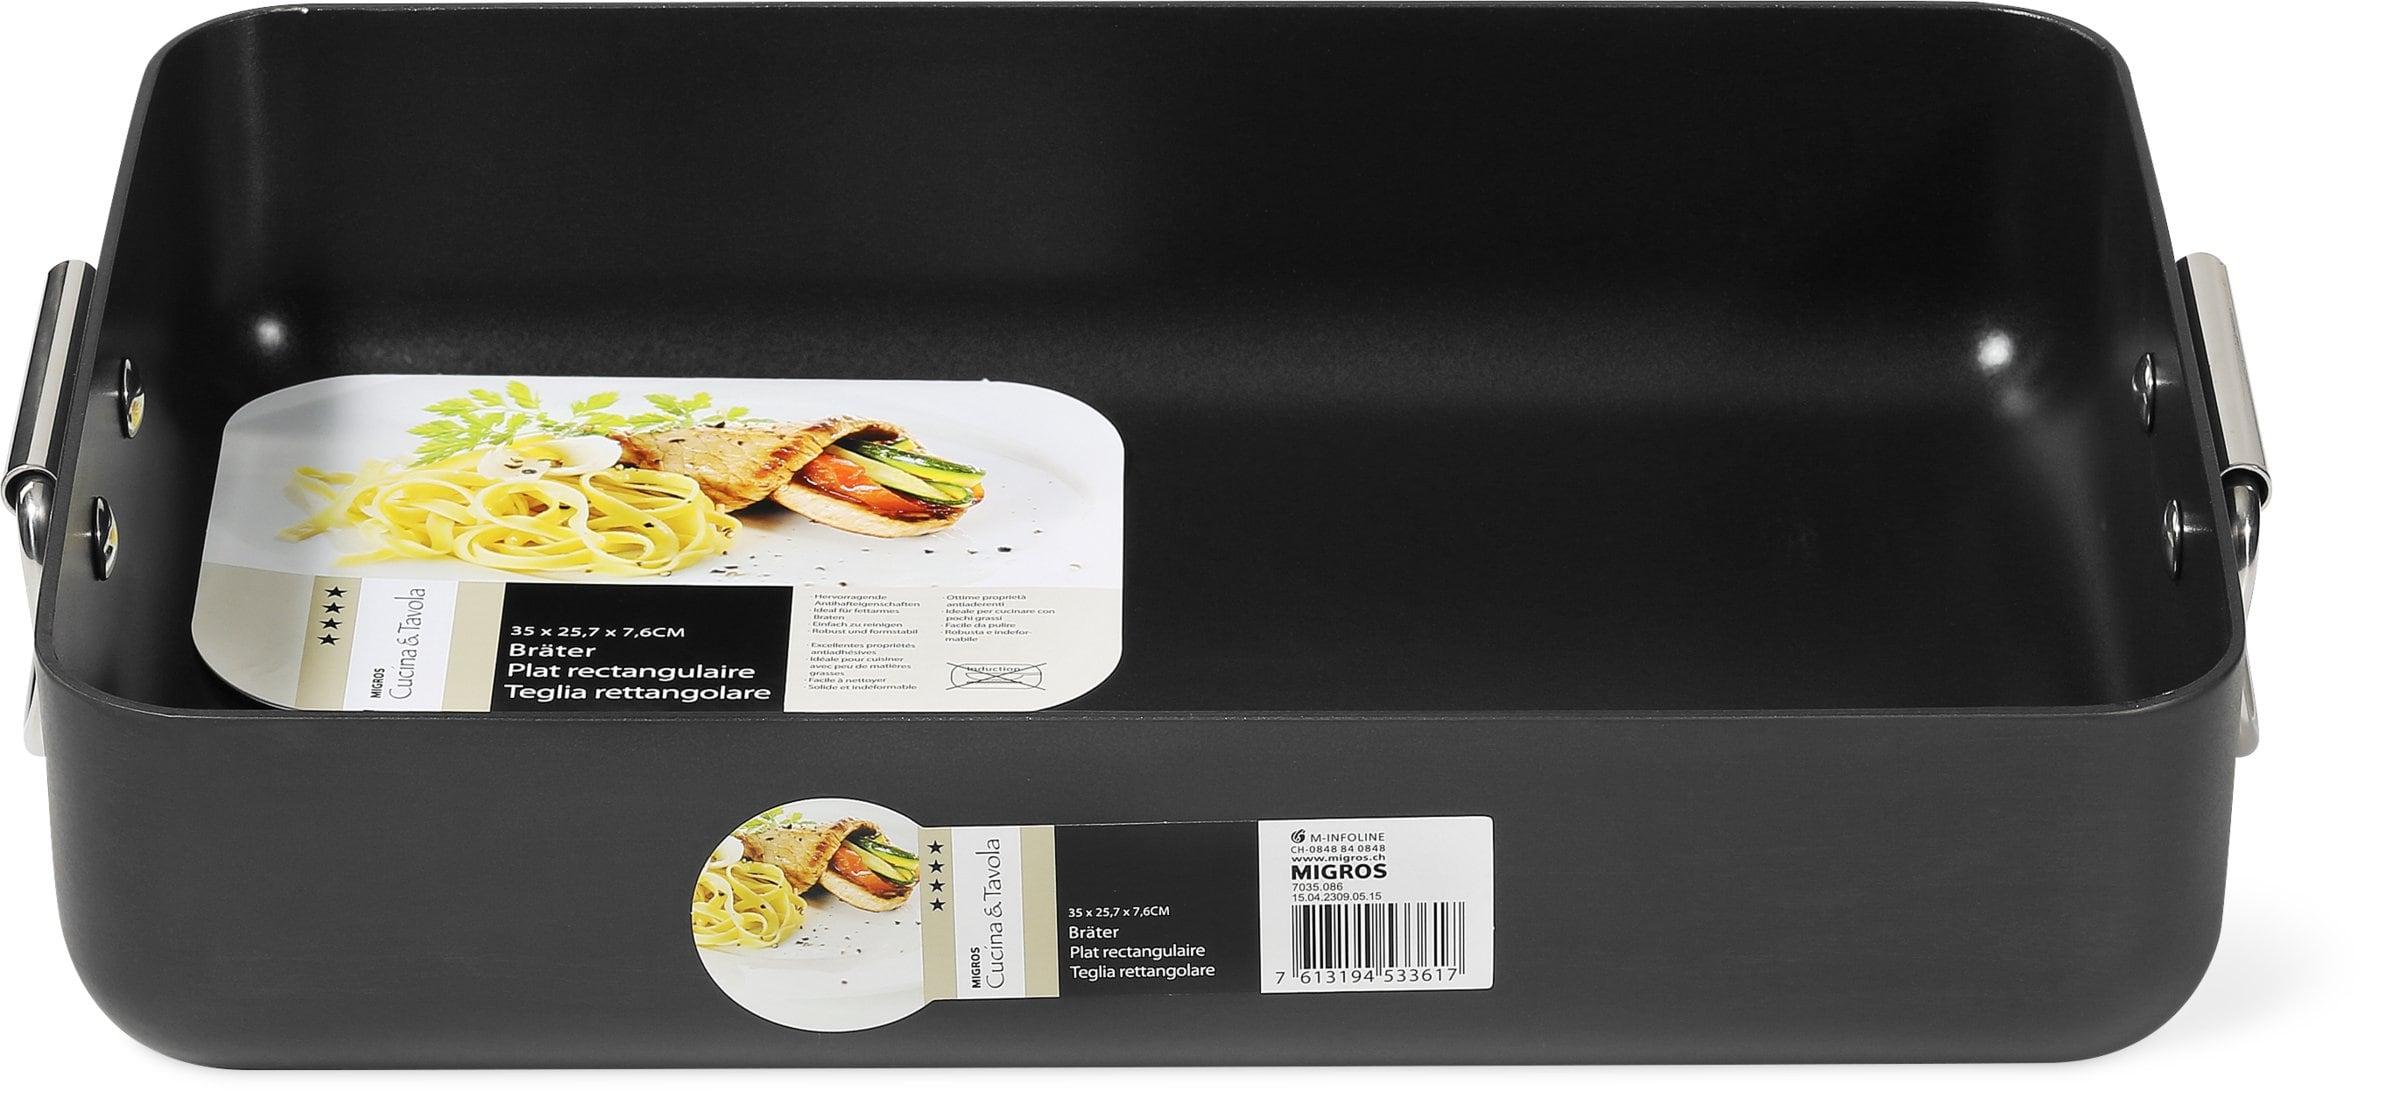 Cucina & Tavola Plat rectangulaire